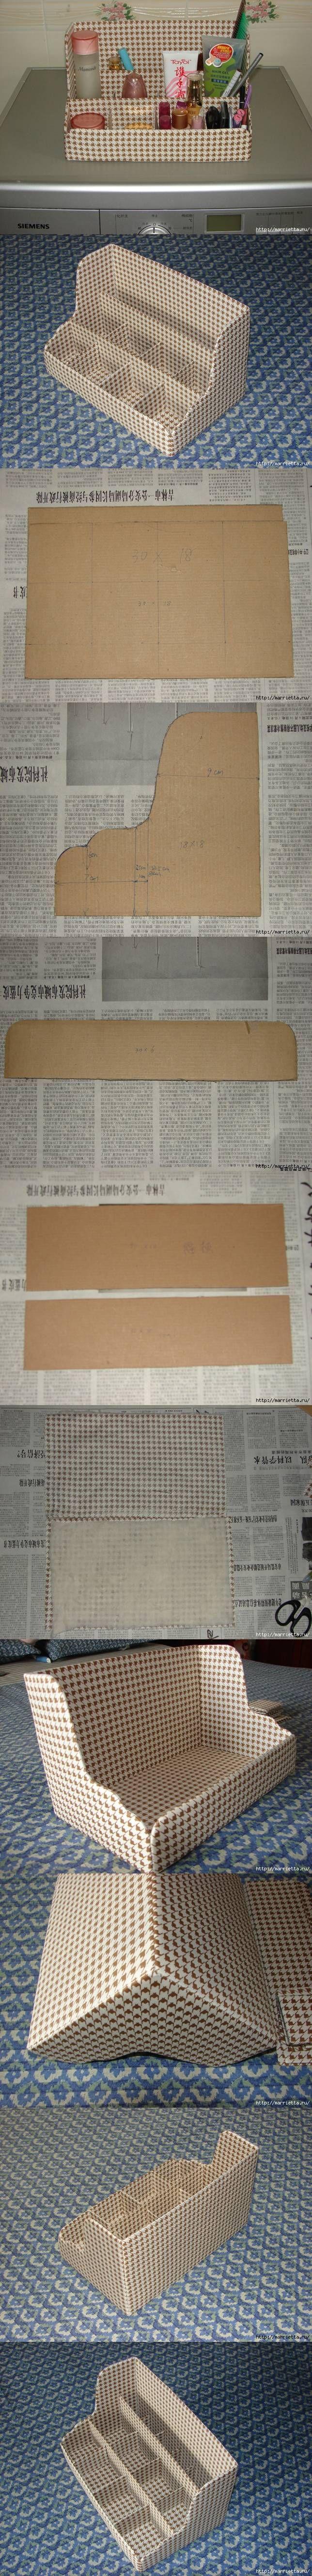 Organizador de oficina para hacer - DIY Cardboard Shelves Organizer